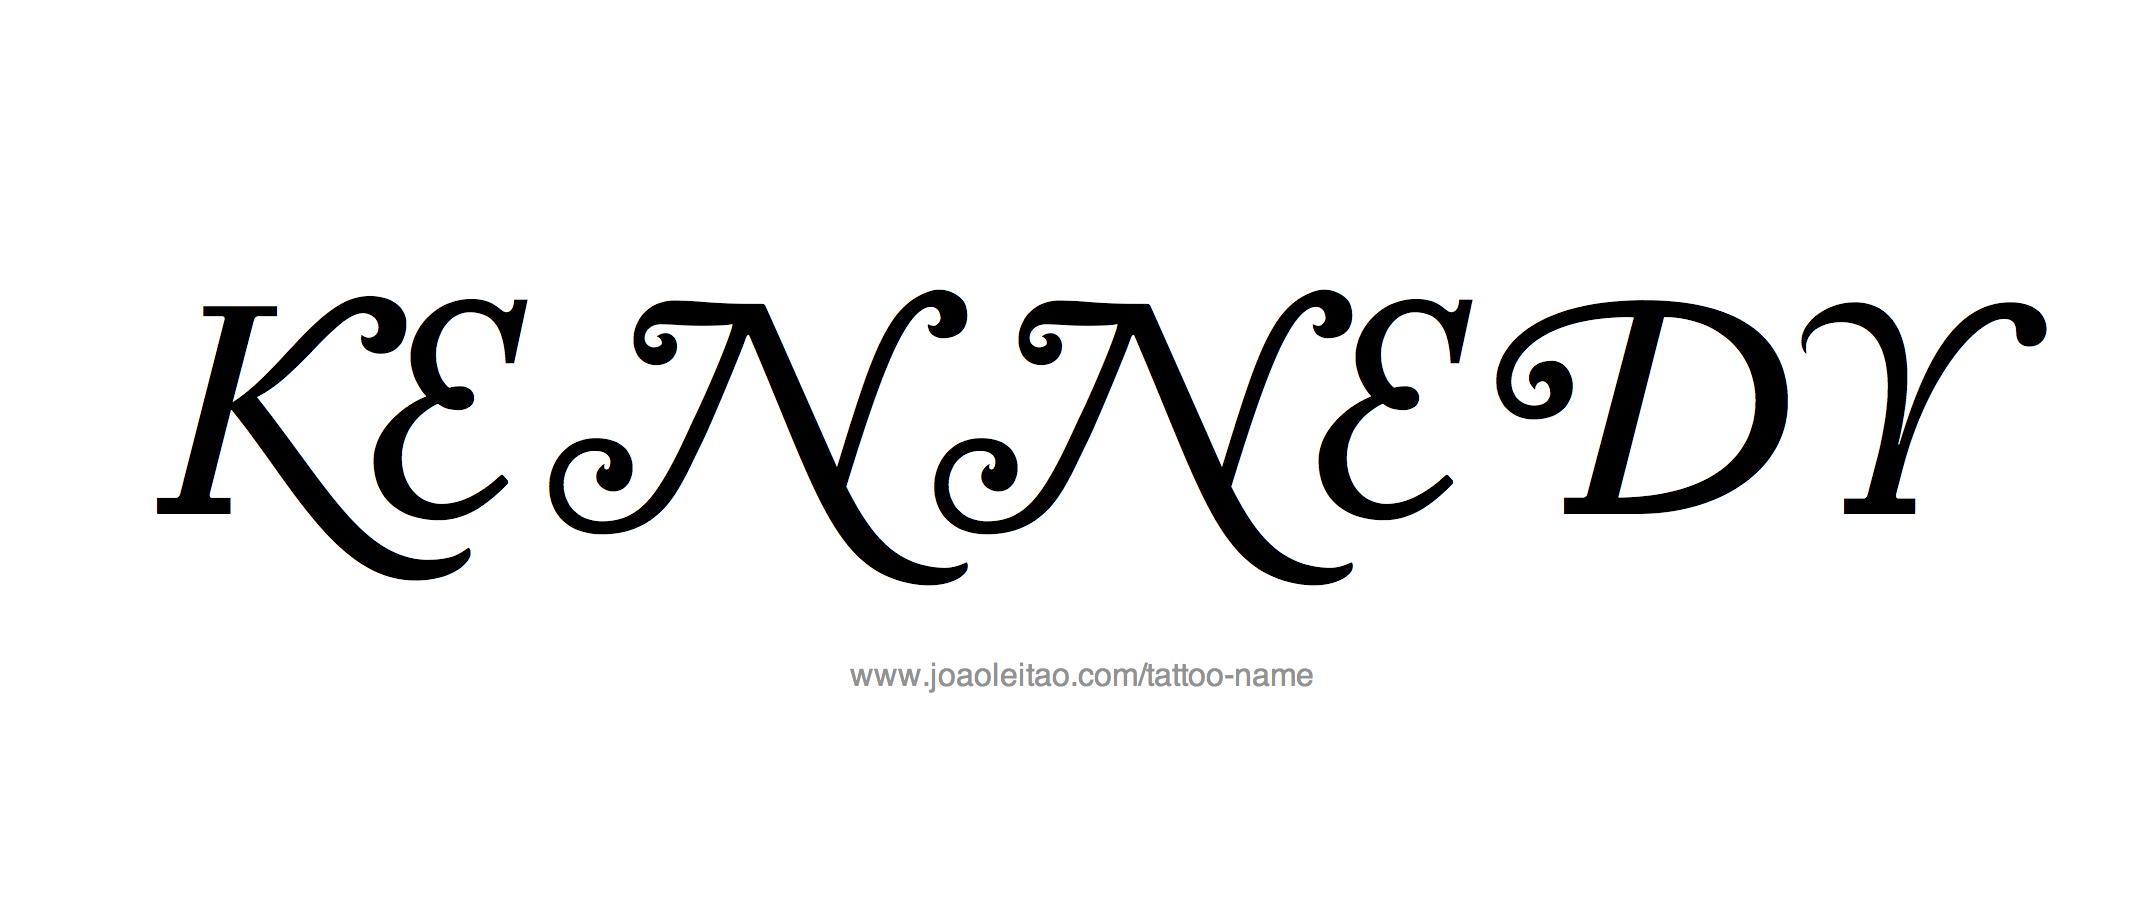 Name: Kennedy Name Tattoo Designs